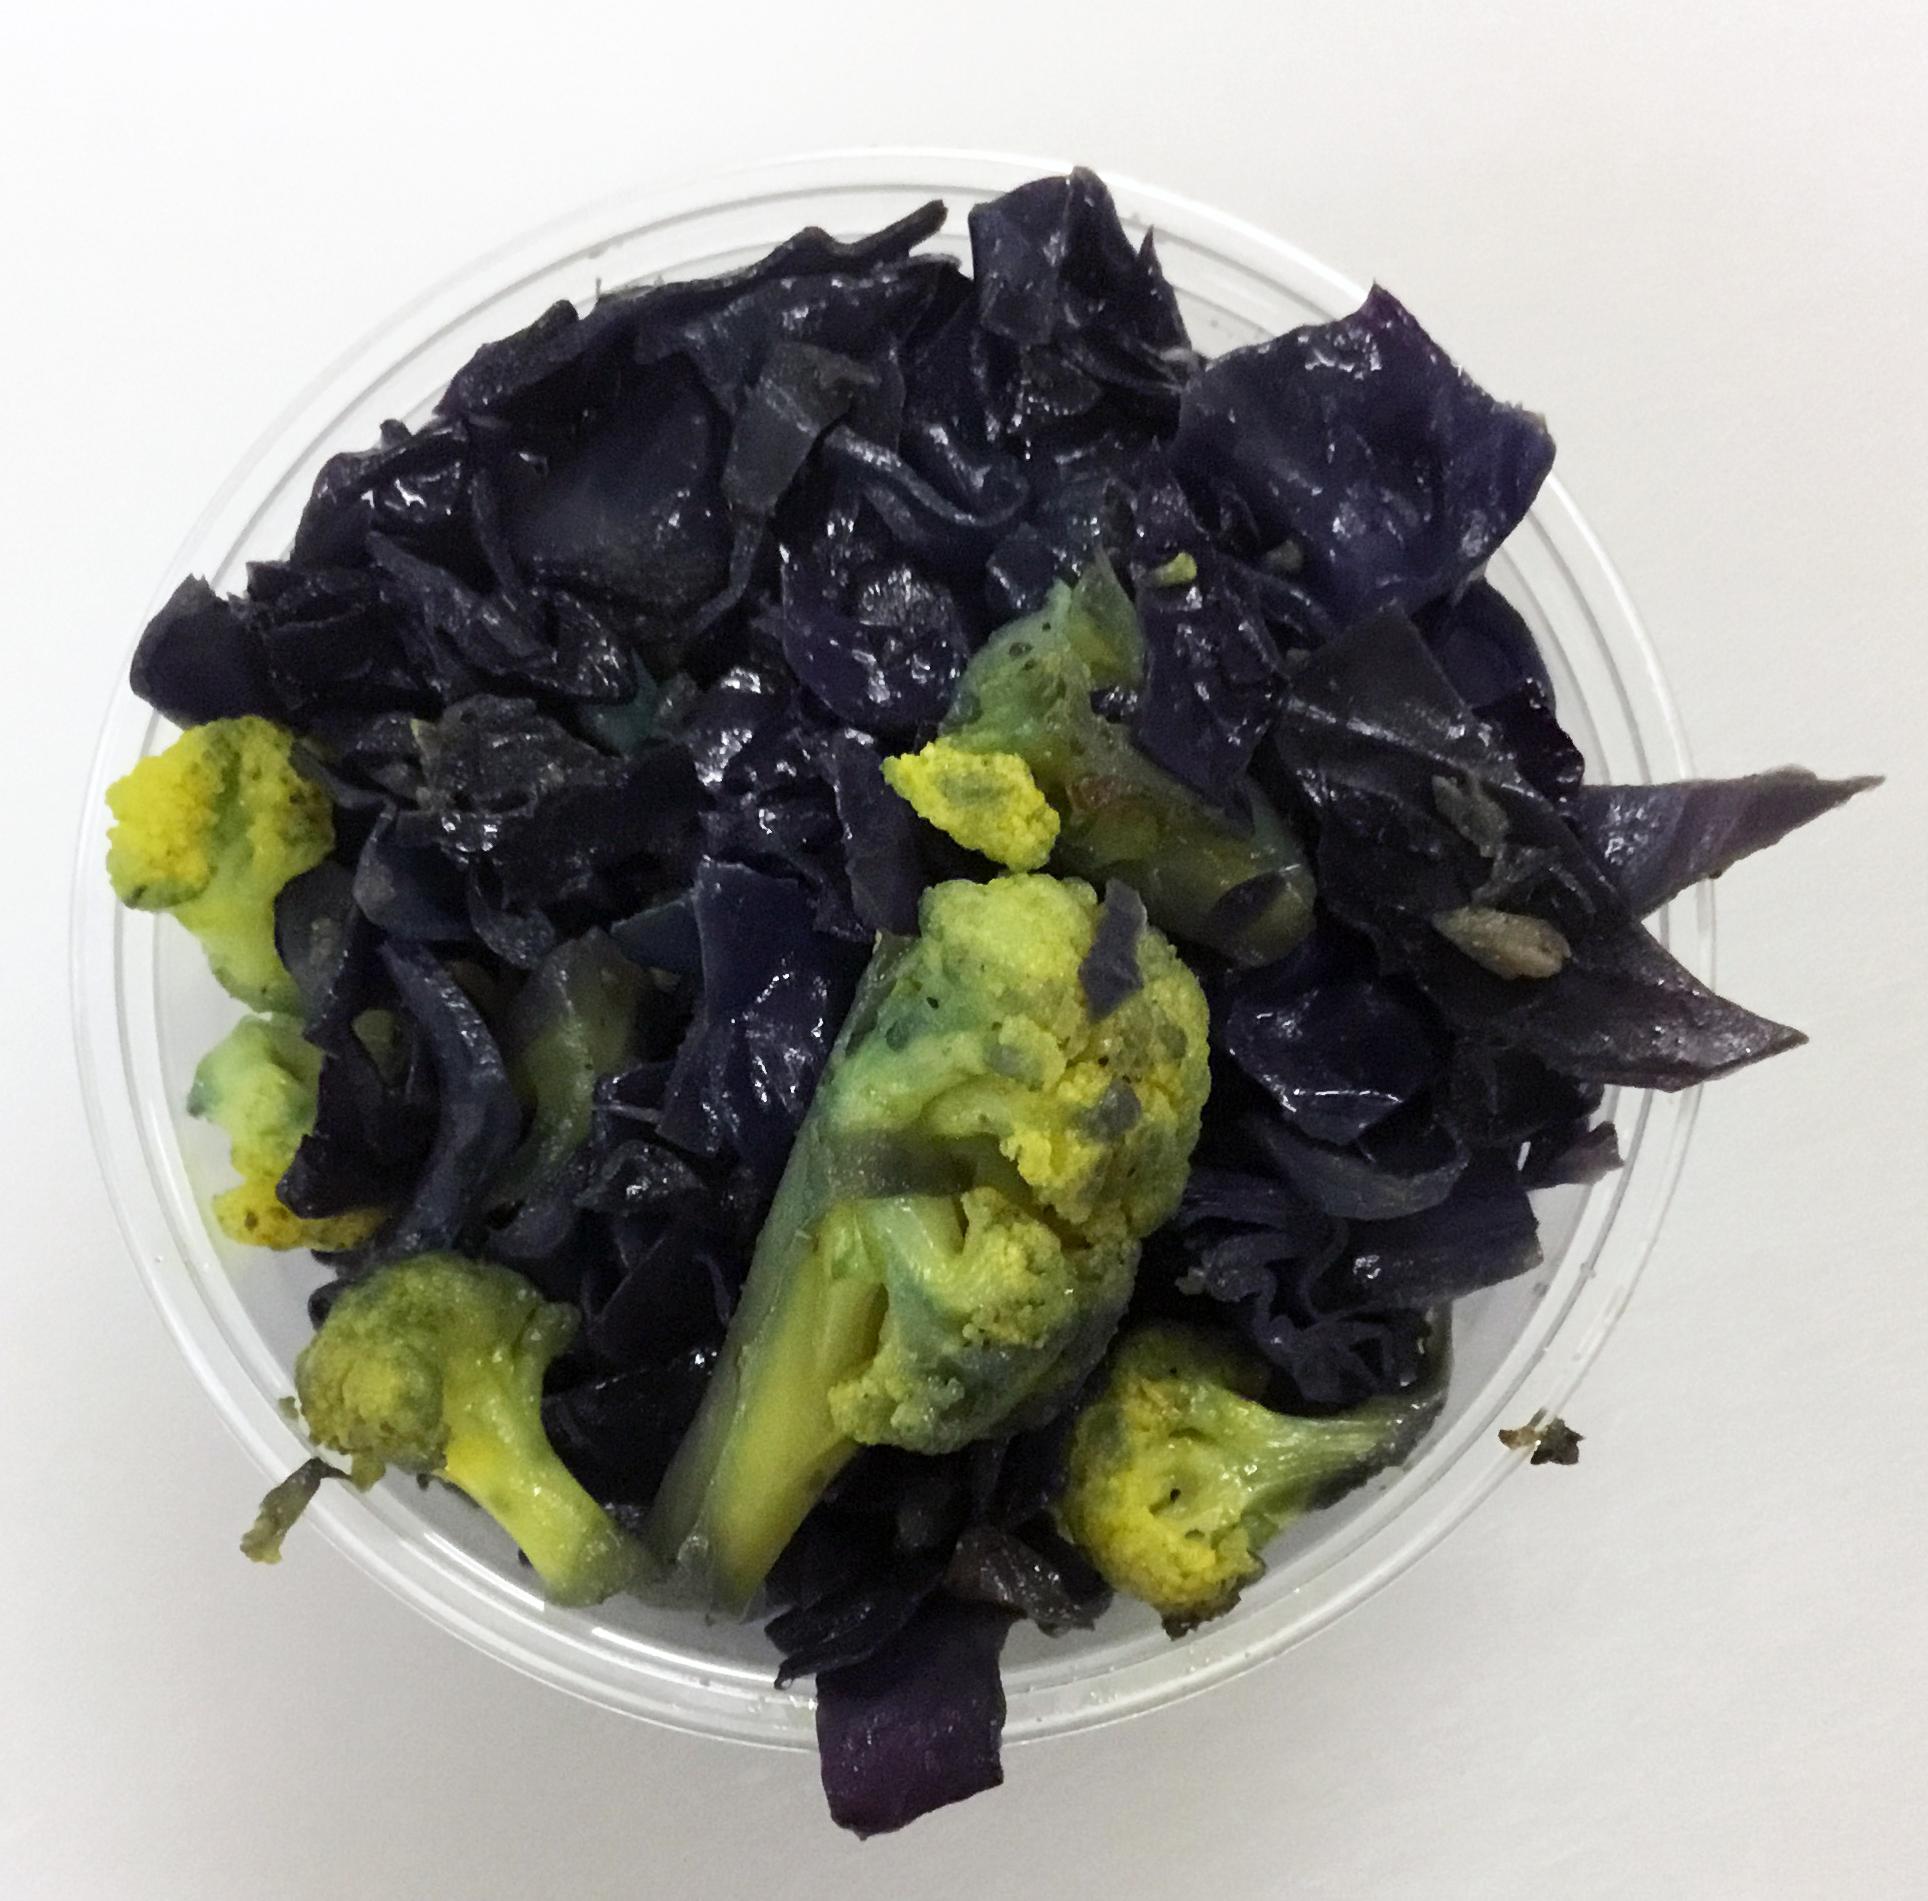 Red cabbage, cauliflower and turmeric sauté.